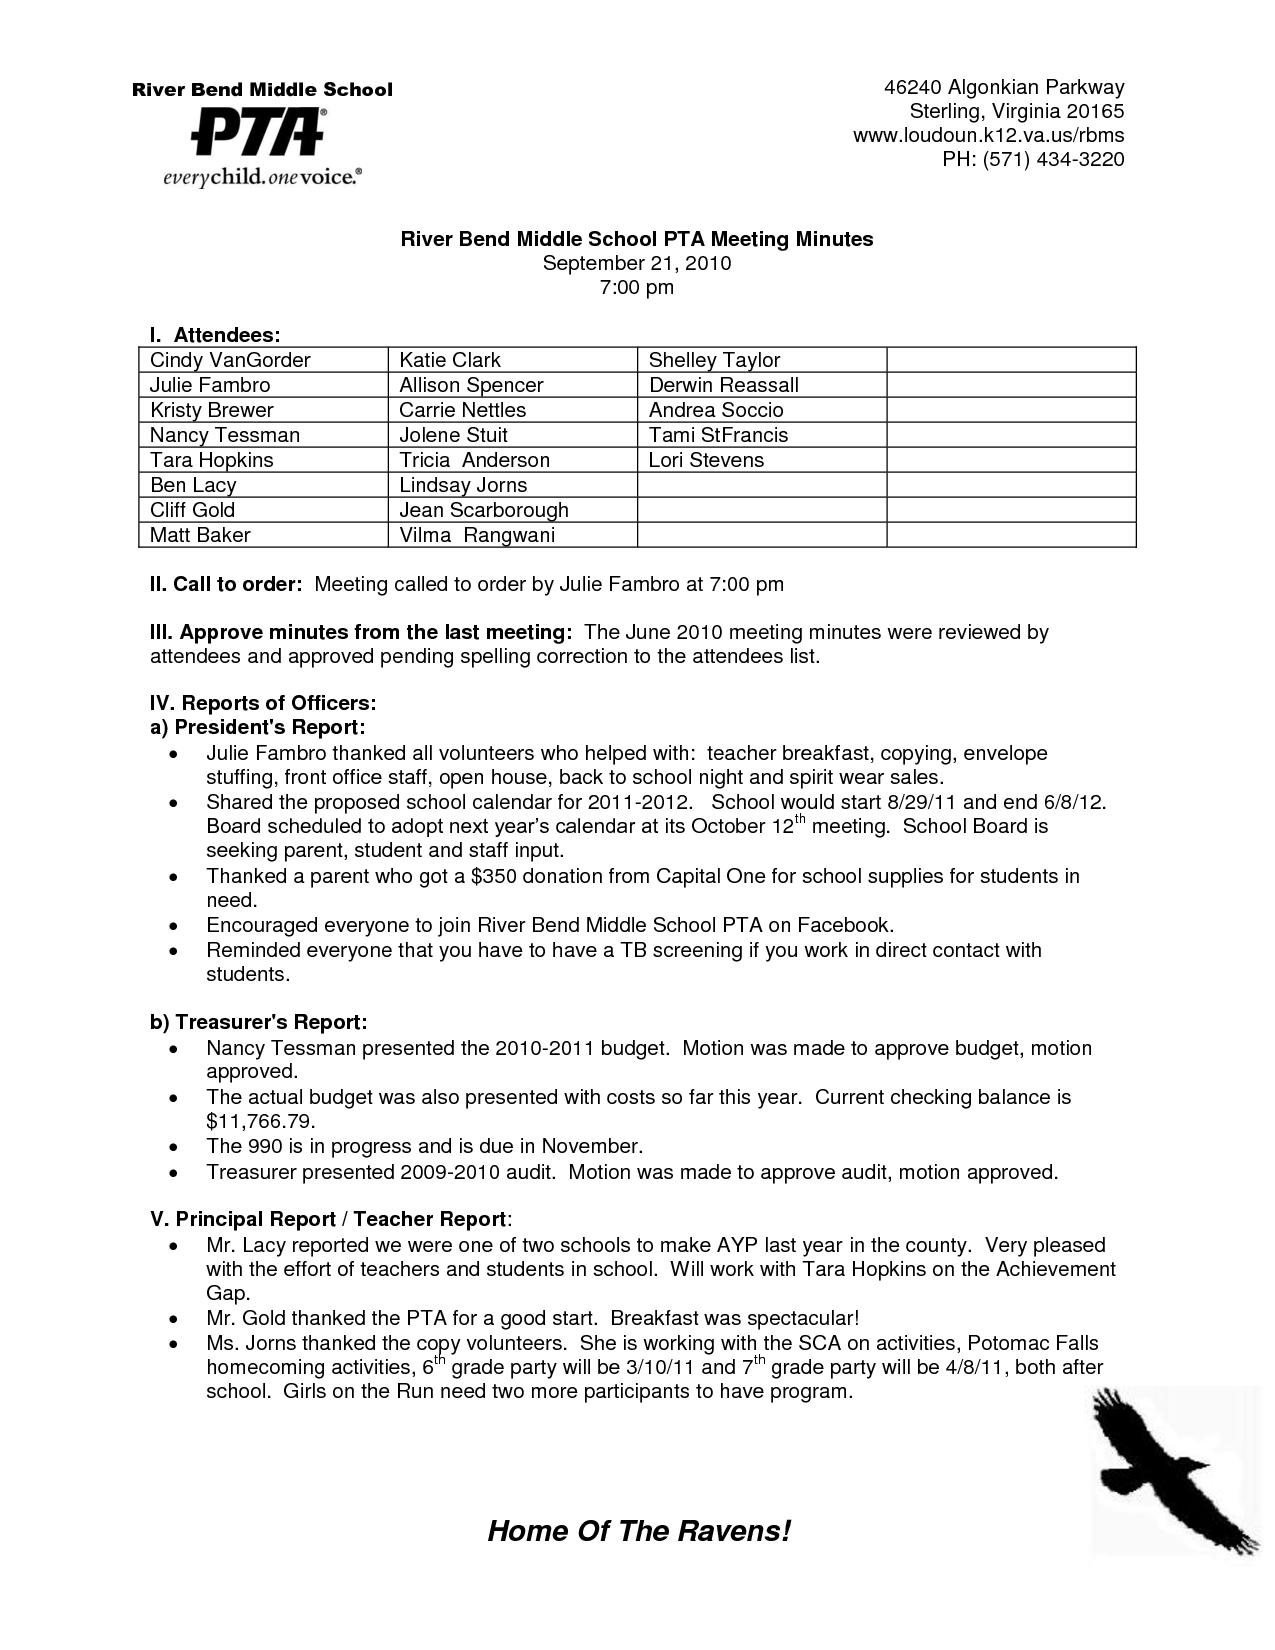 Pta Secretary Minutes Template